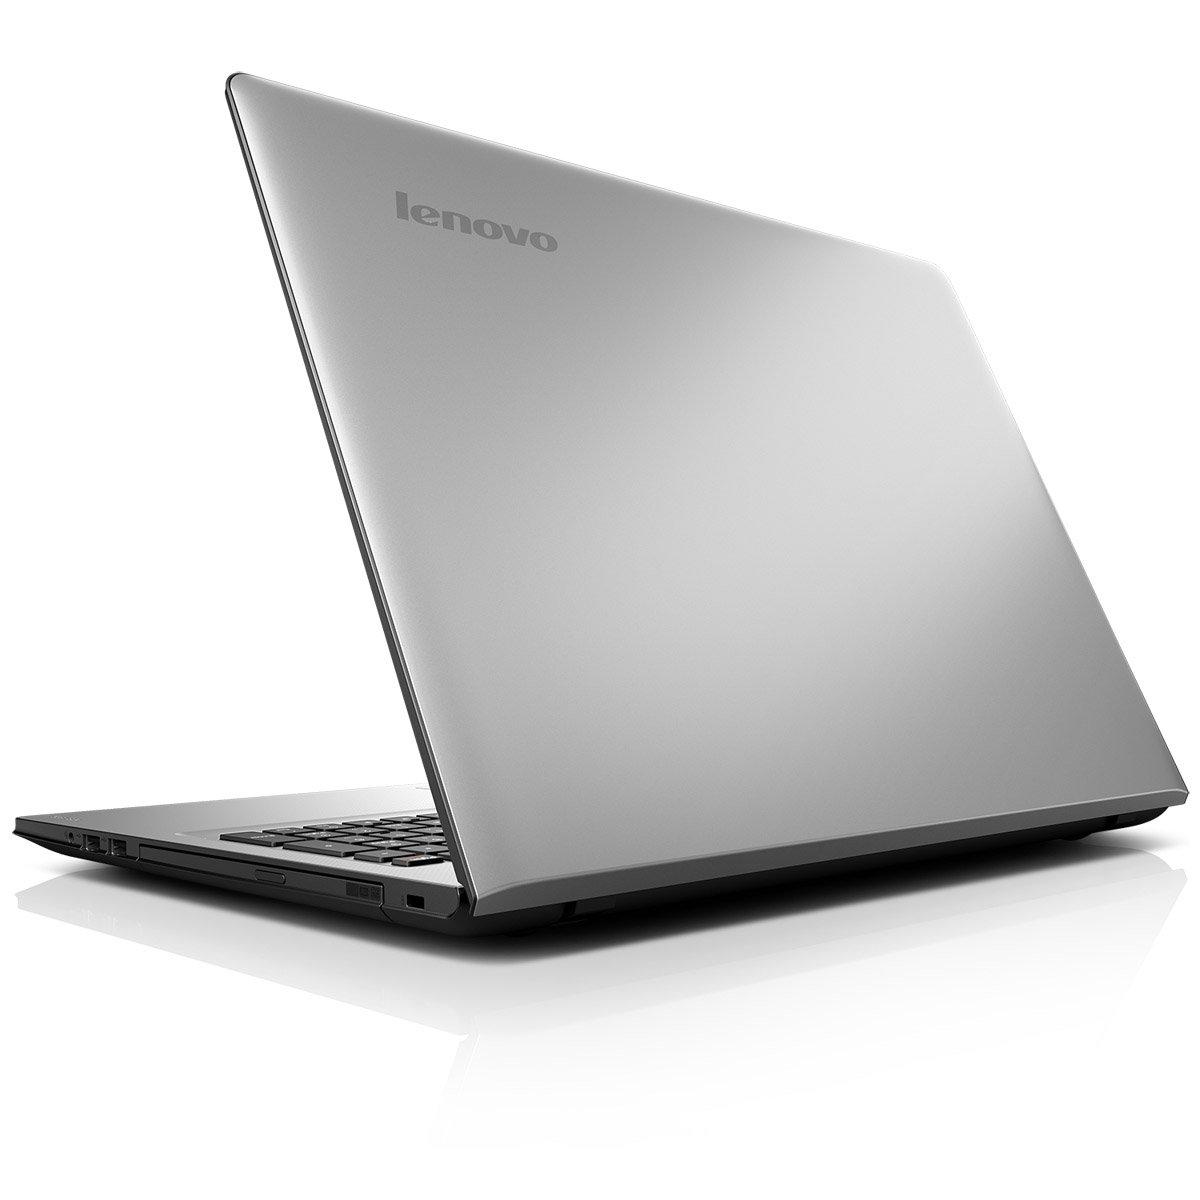 Laptop lenovo ideapad 300 14isk i3s sears com mx me for Mediaworld lavatrici slim